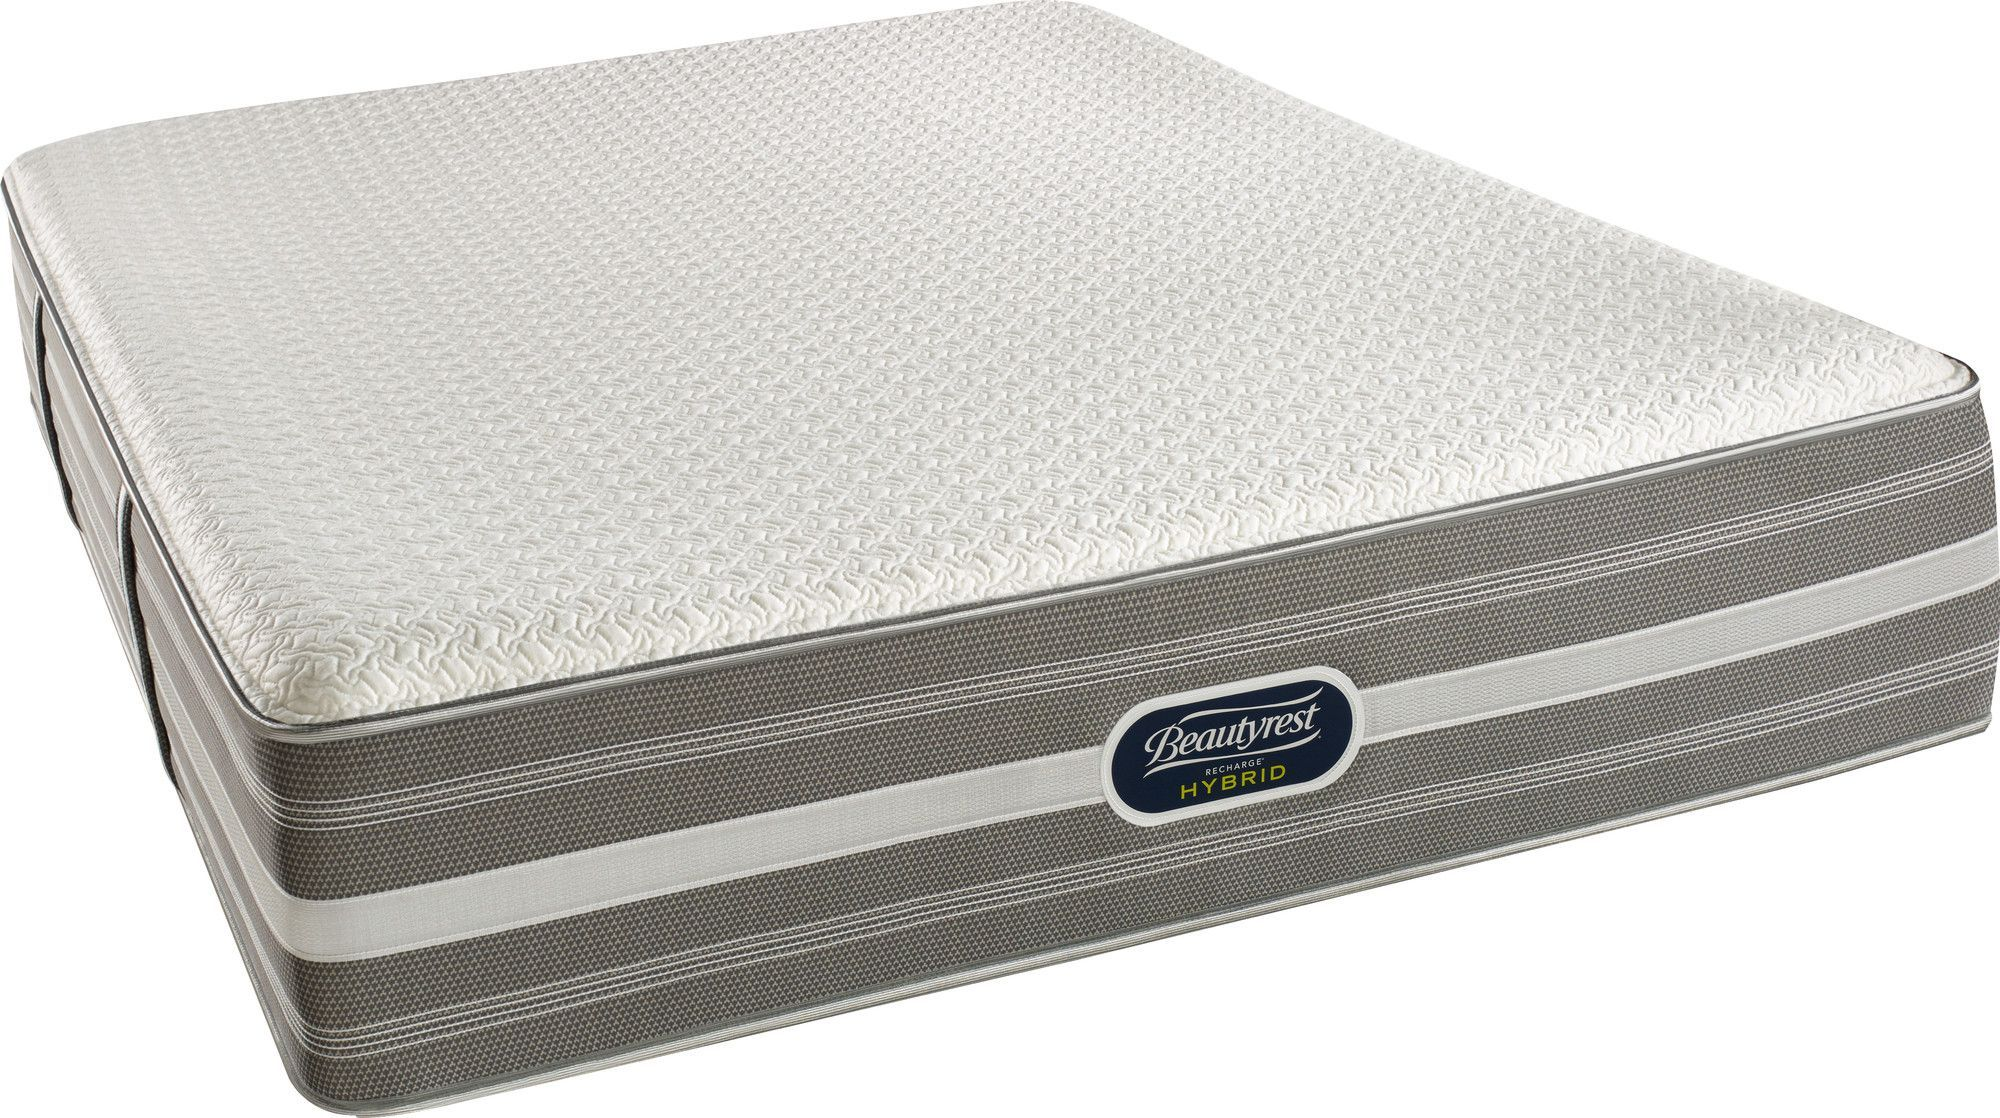 "Serta Perfect Sleeper 14.75"" Standale II Pillow Top Firm"